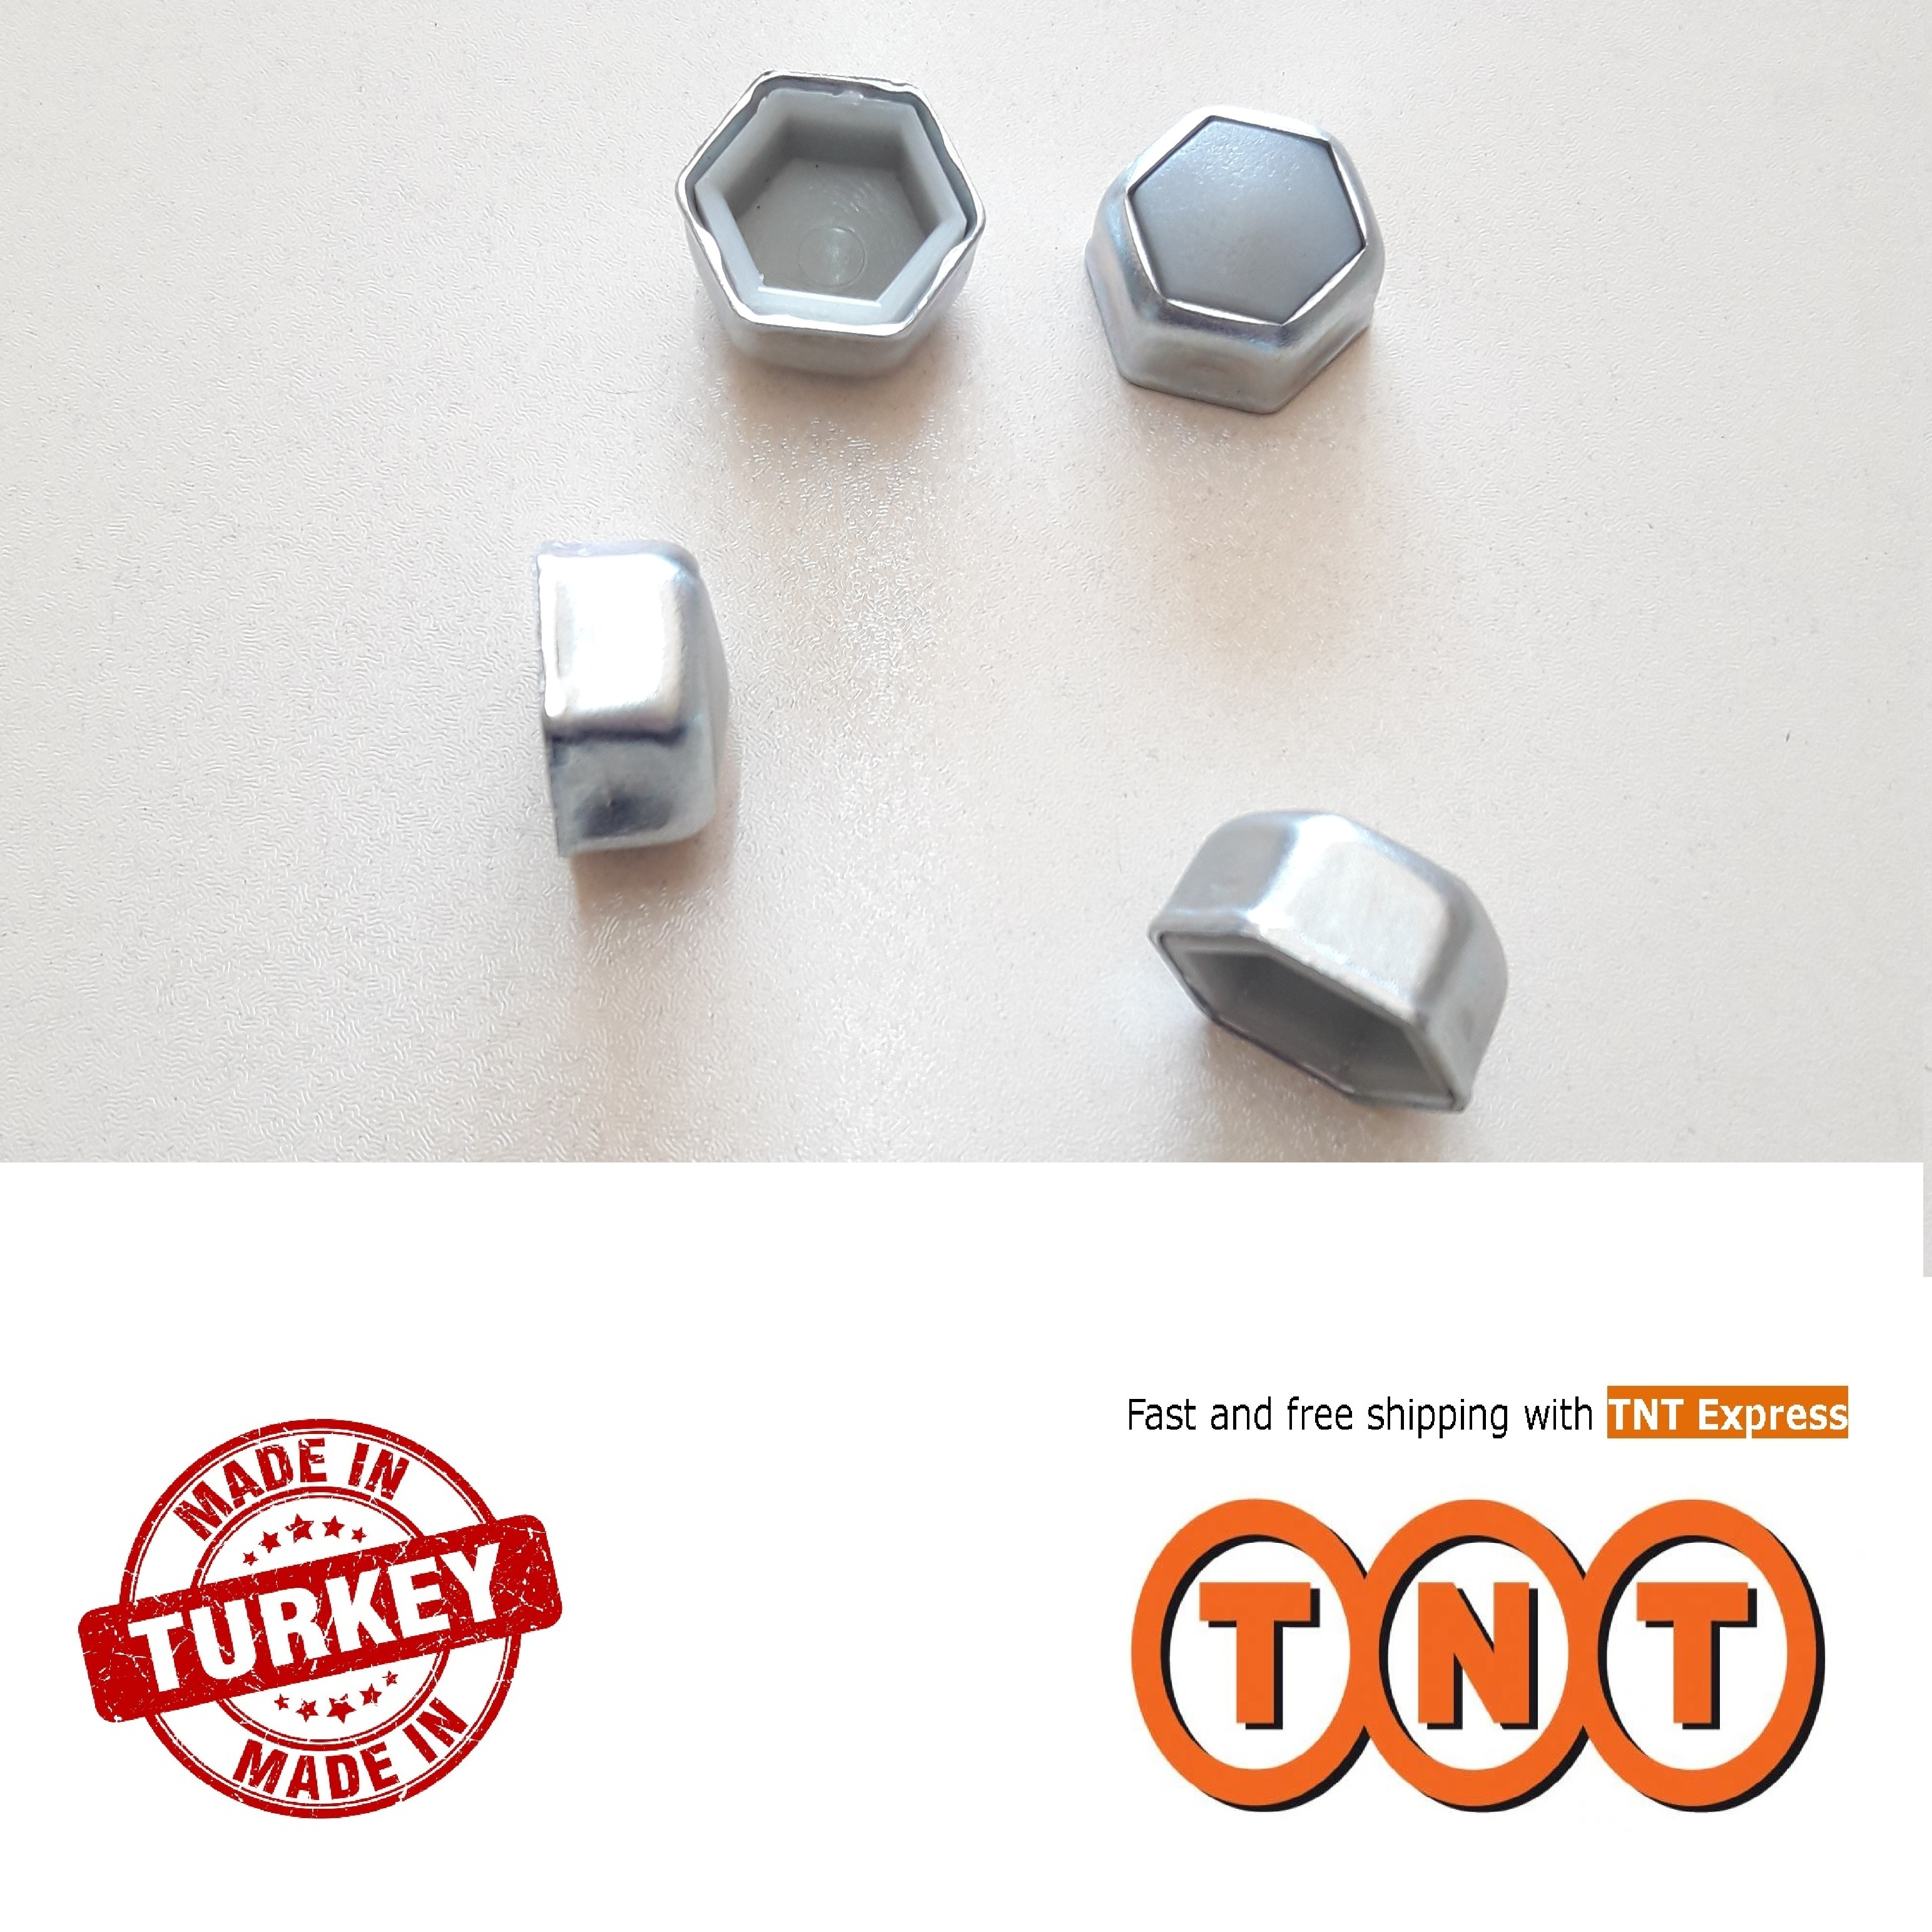 1 Set 4 Pcs Steering Lock Stop Cap Cover Caps for Navara D22 4WD 4x4 40039-2S610 400392S610 / Free TNT Express Shipping